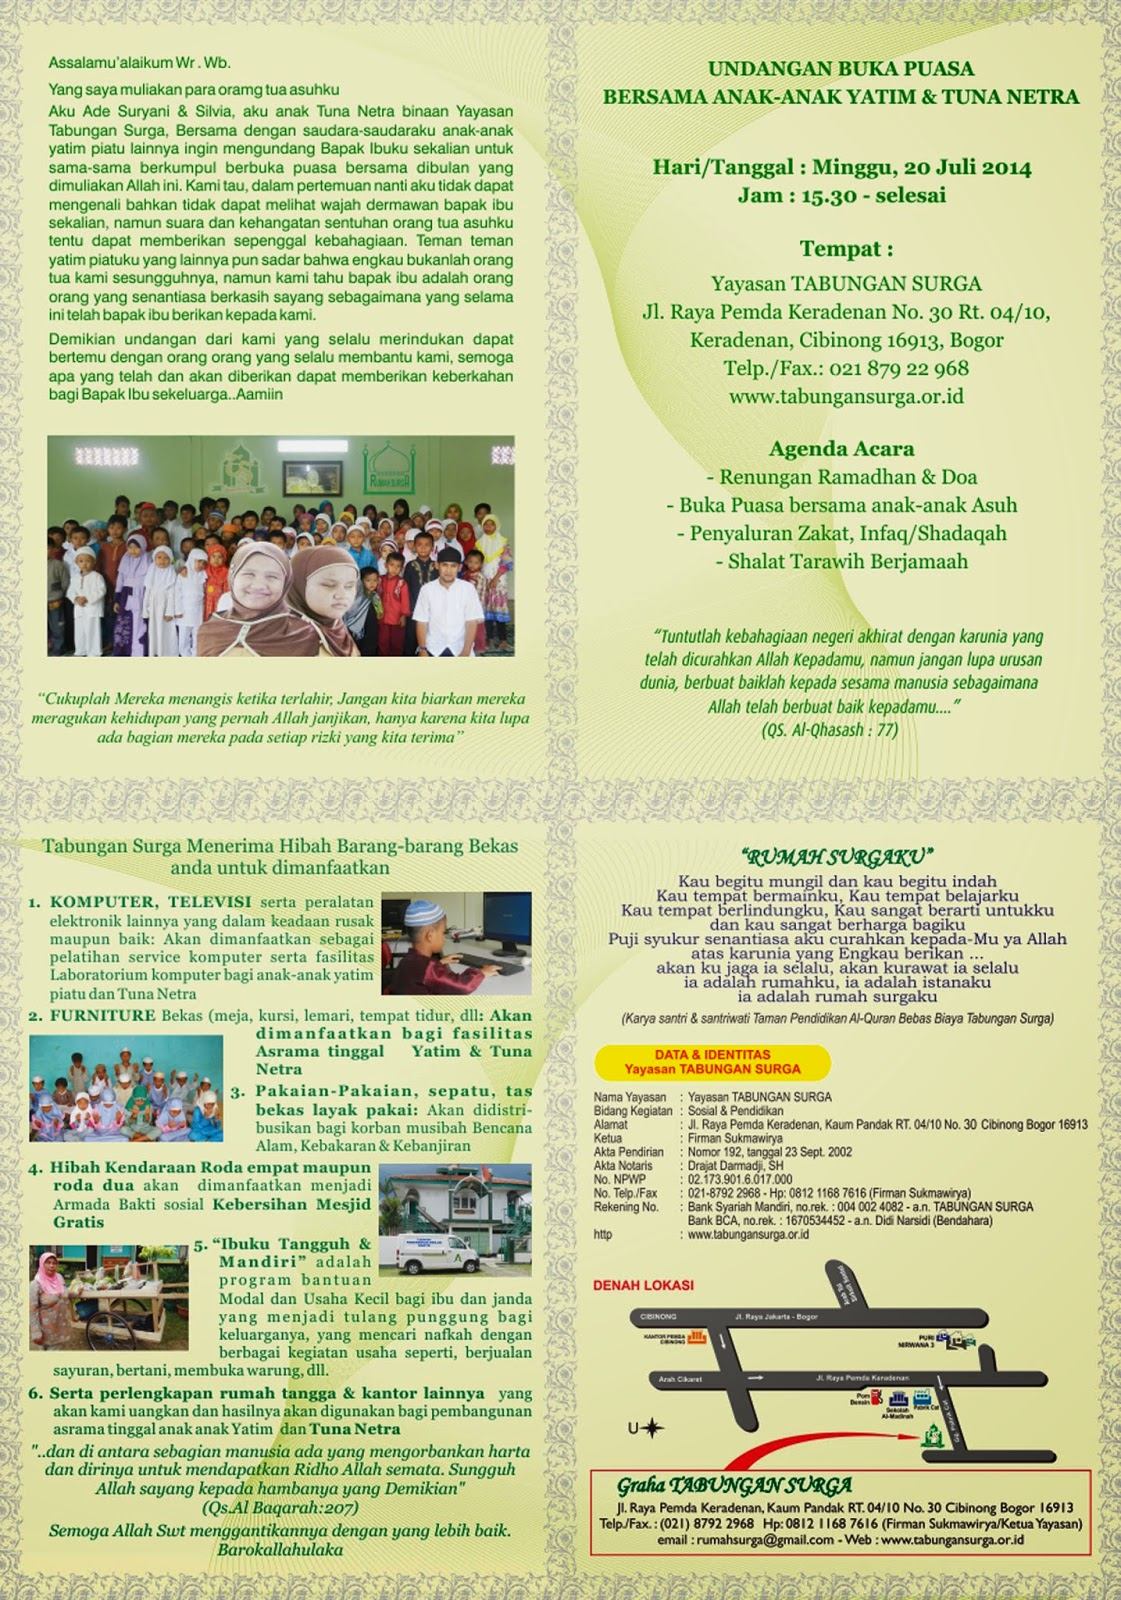 Yayasan Tabungan Surga Undangan Buka Puasa Bersama Anak Yatim Piatu